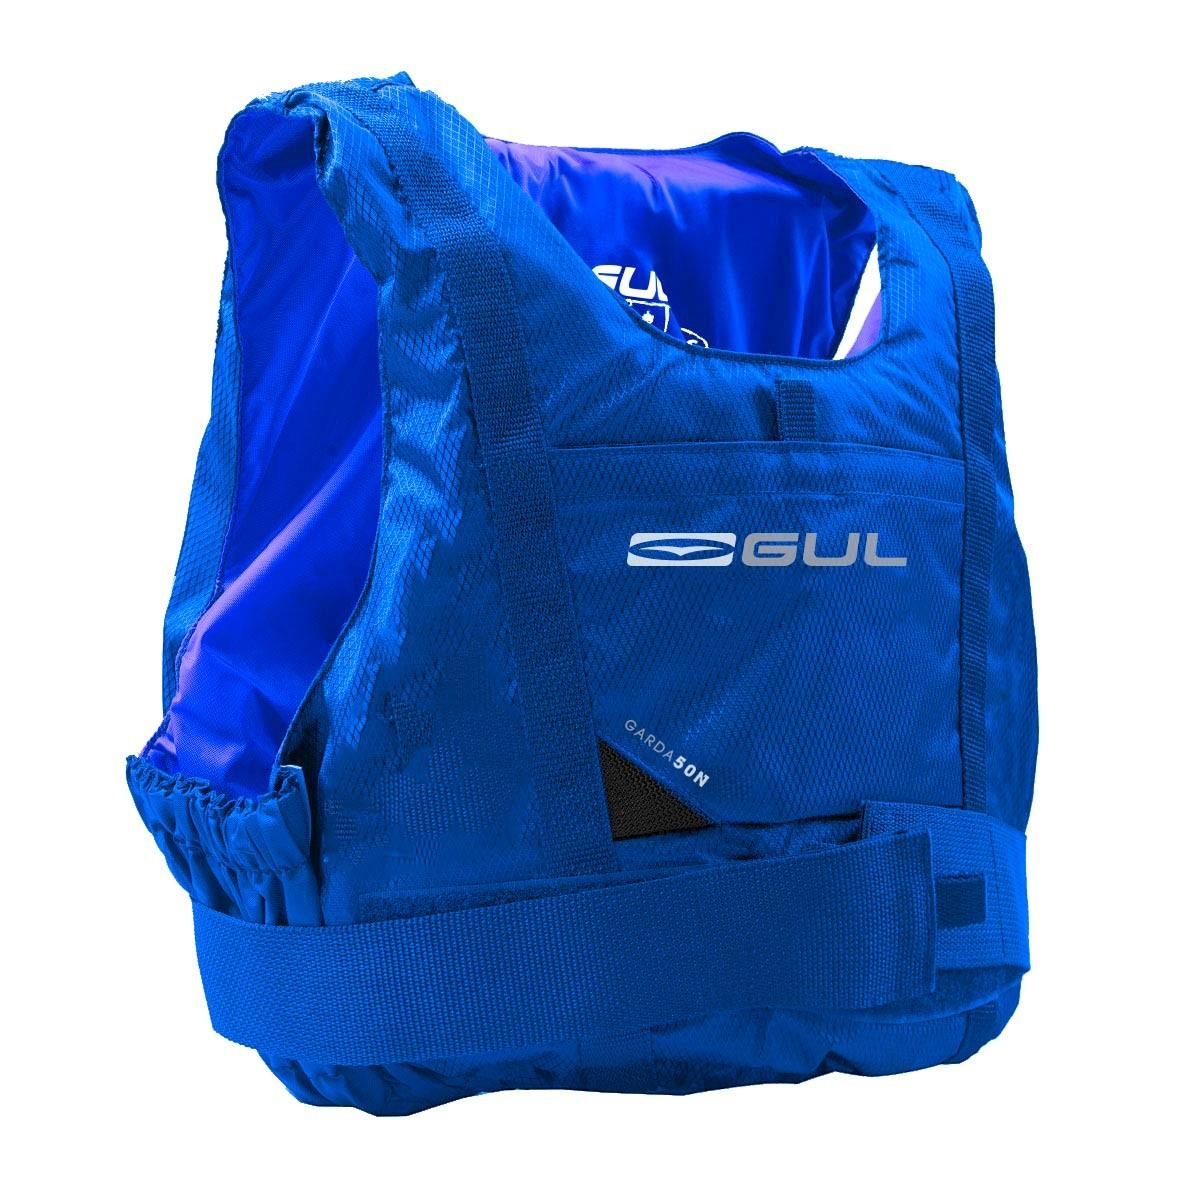 záchranná vesta GUL Garda 50N GM0002 modrá - M